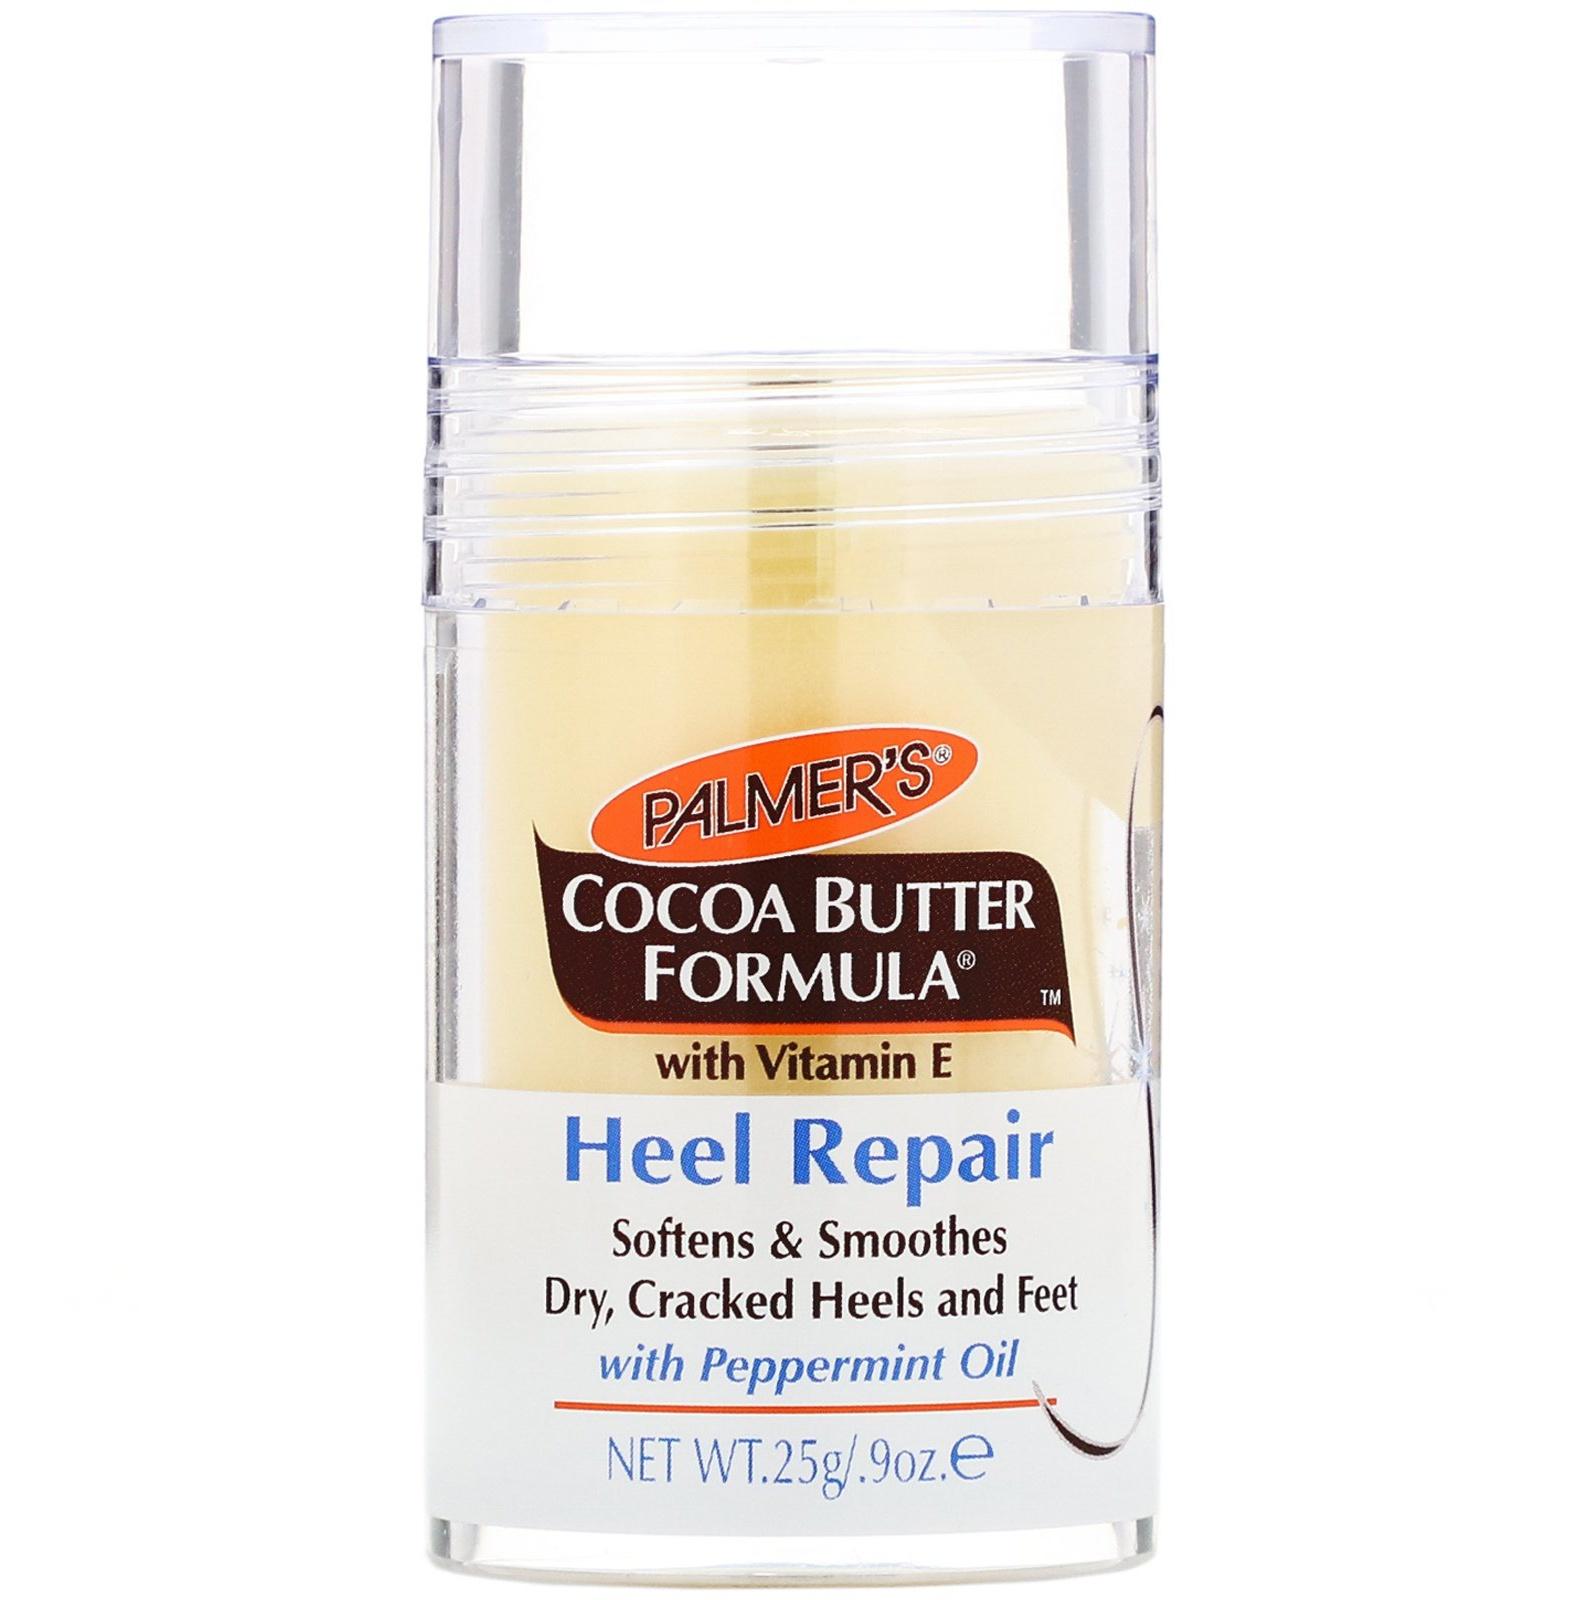 Palmer's Cocoa Butter Formula With Vitamin E Heel Repair